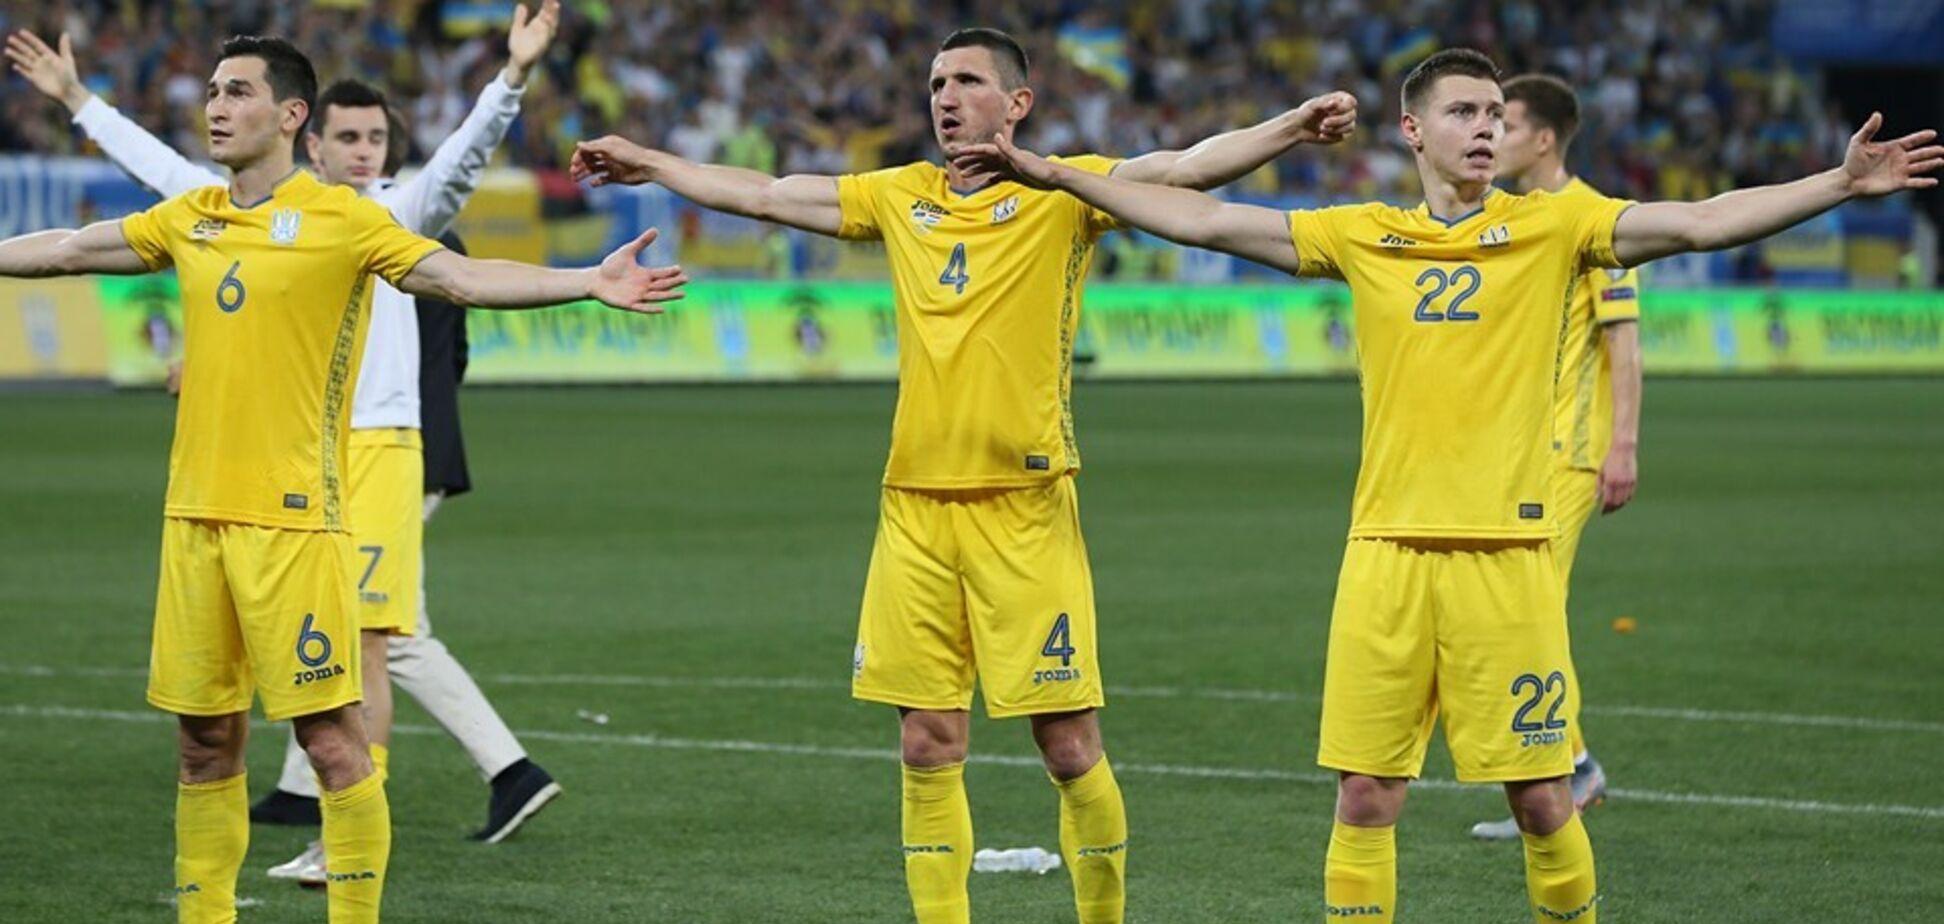 Разгром! Литва – Украина: смотреть онлайн матч отбора Евро-2020